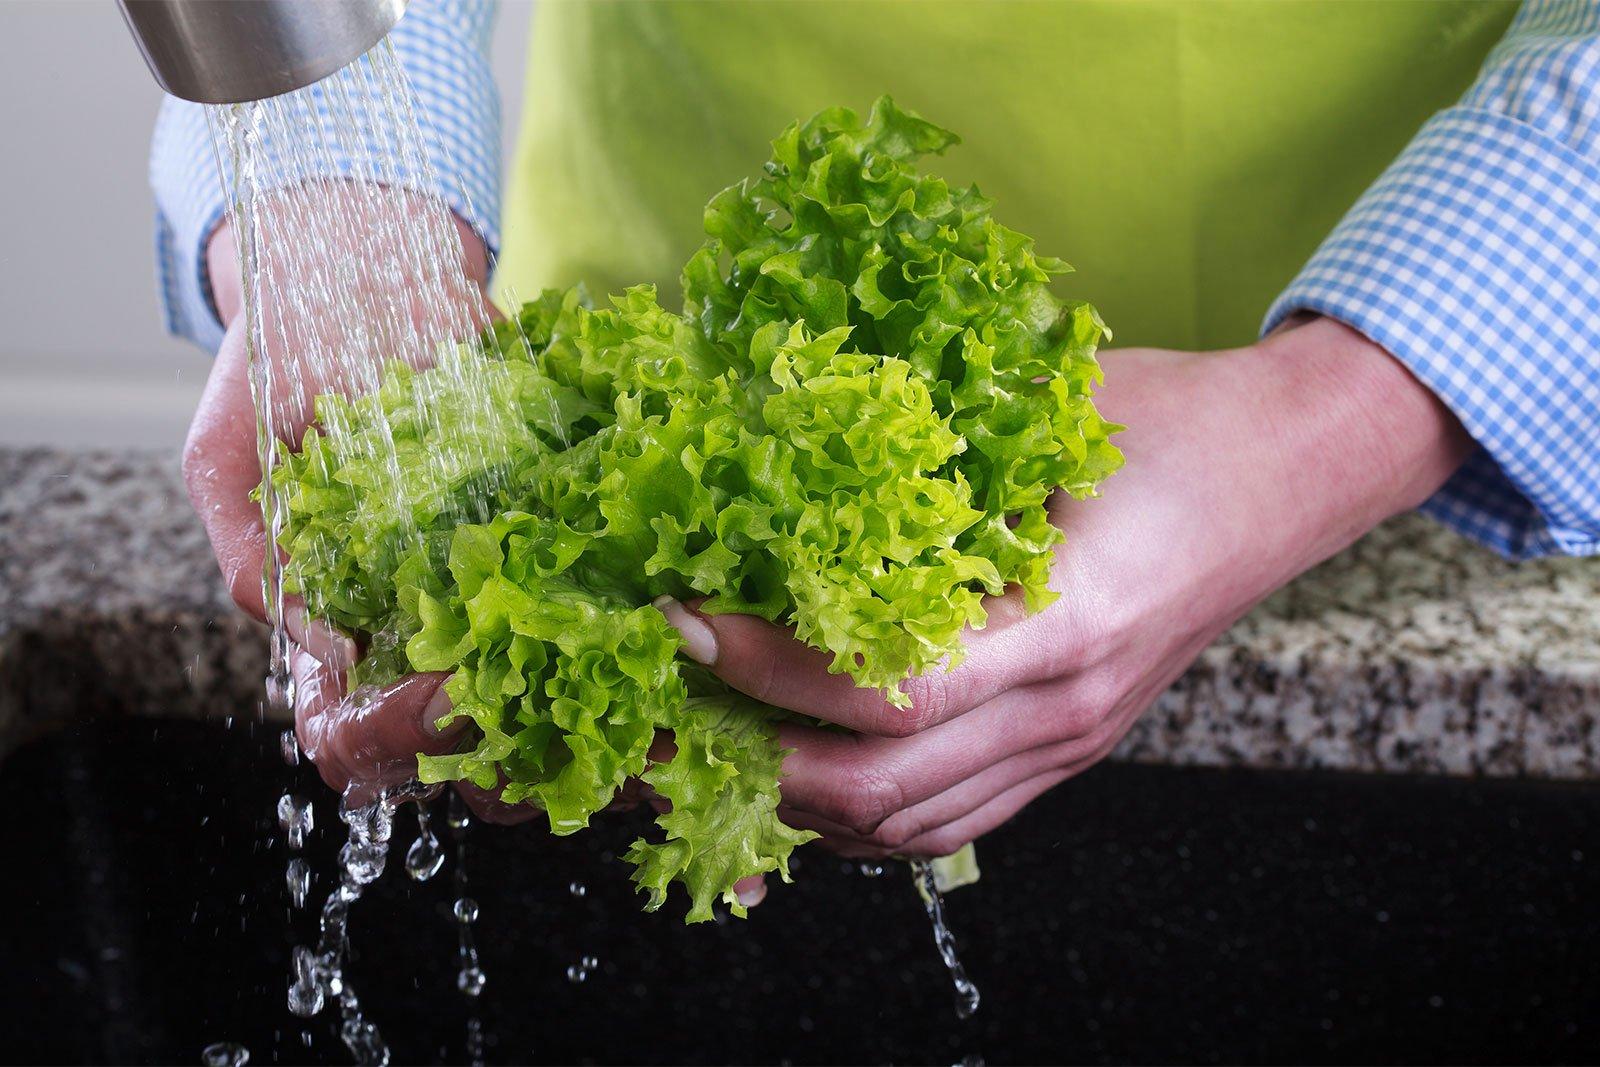 Wahing fresh lettuce